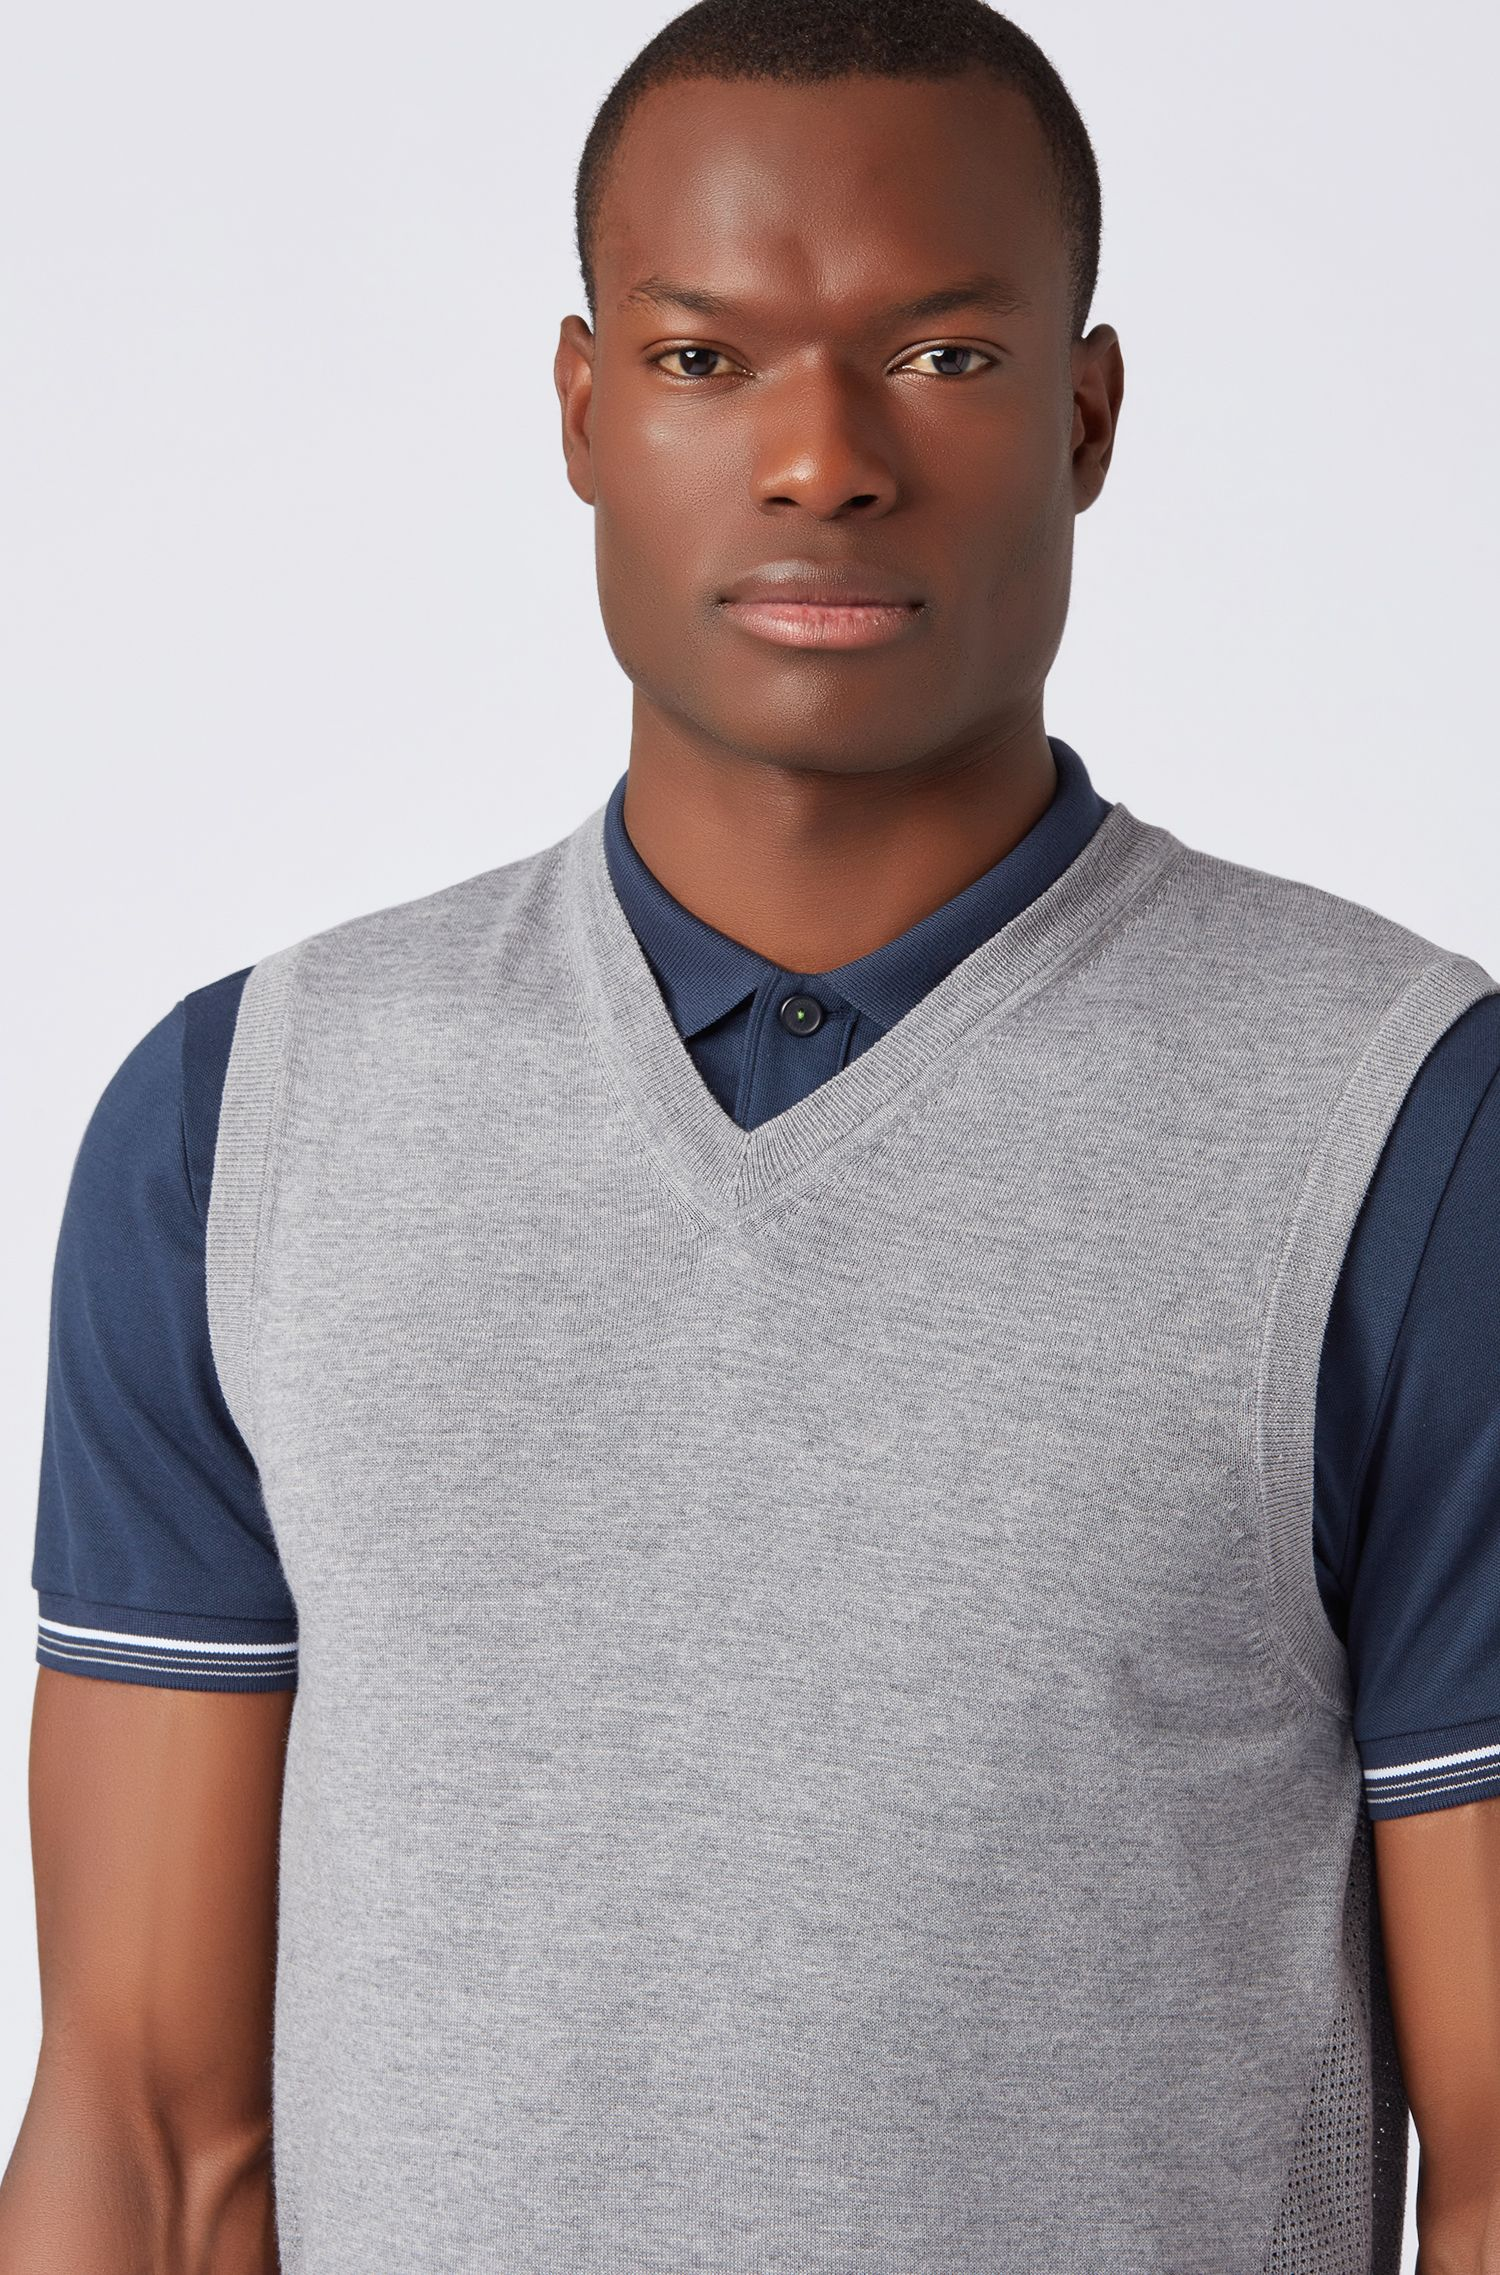 Chaleco jersey de lana repelente al agua con detalles de malla, Gris claro